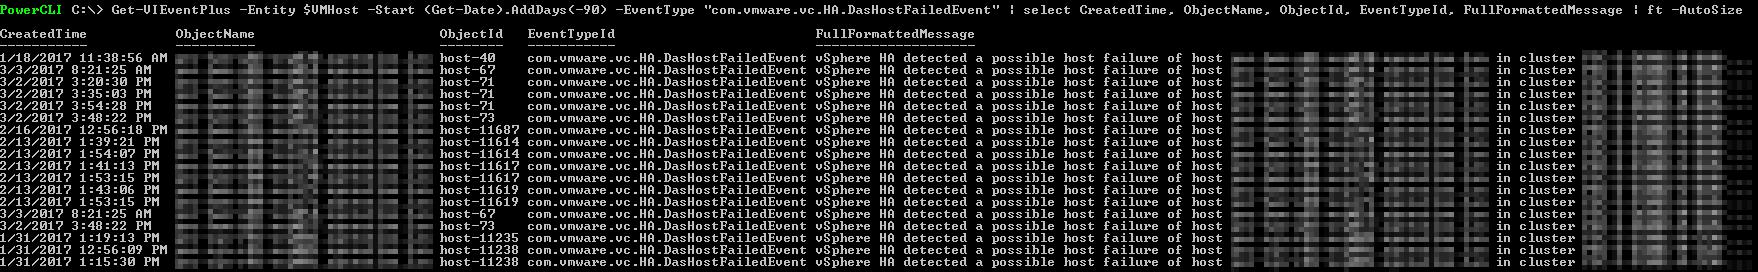 PowerCLI - vSphere HA isolation Events